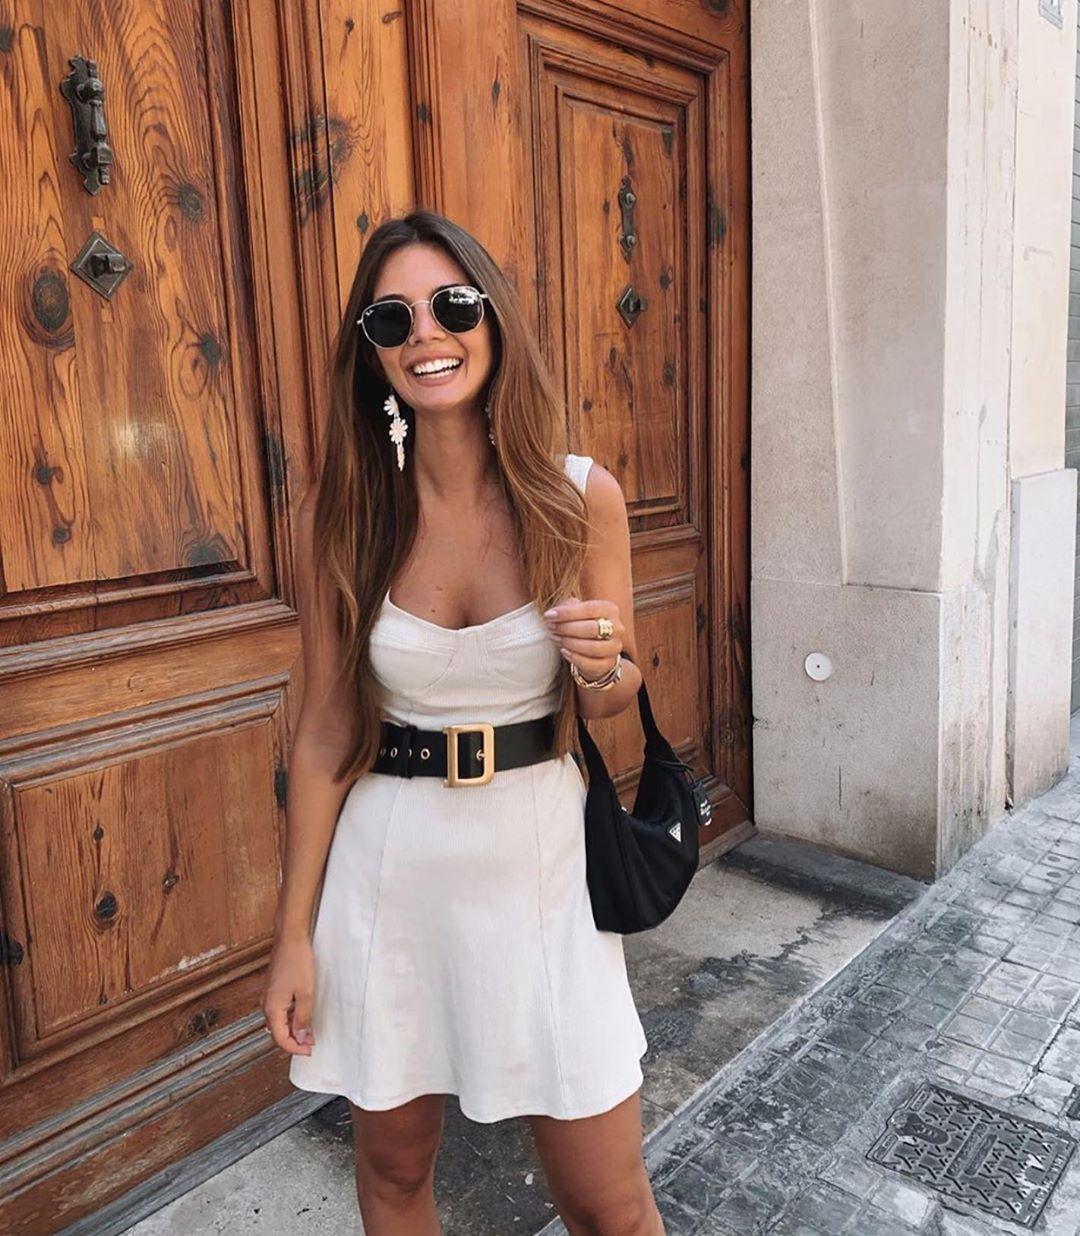 ribbed dress de Zara sur zaraaddiction